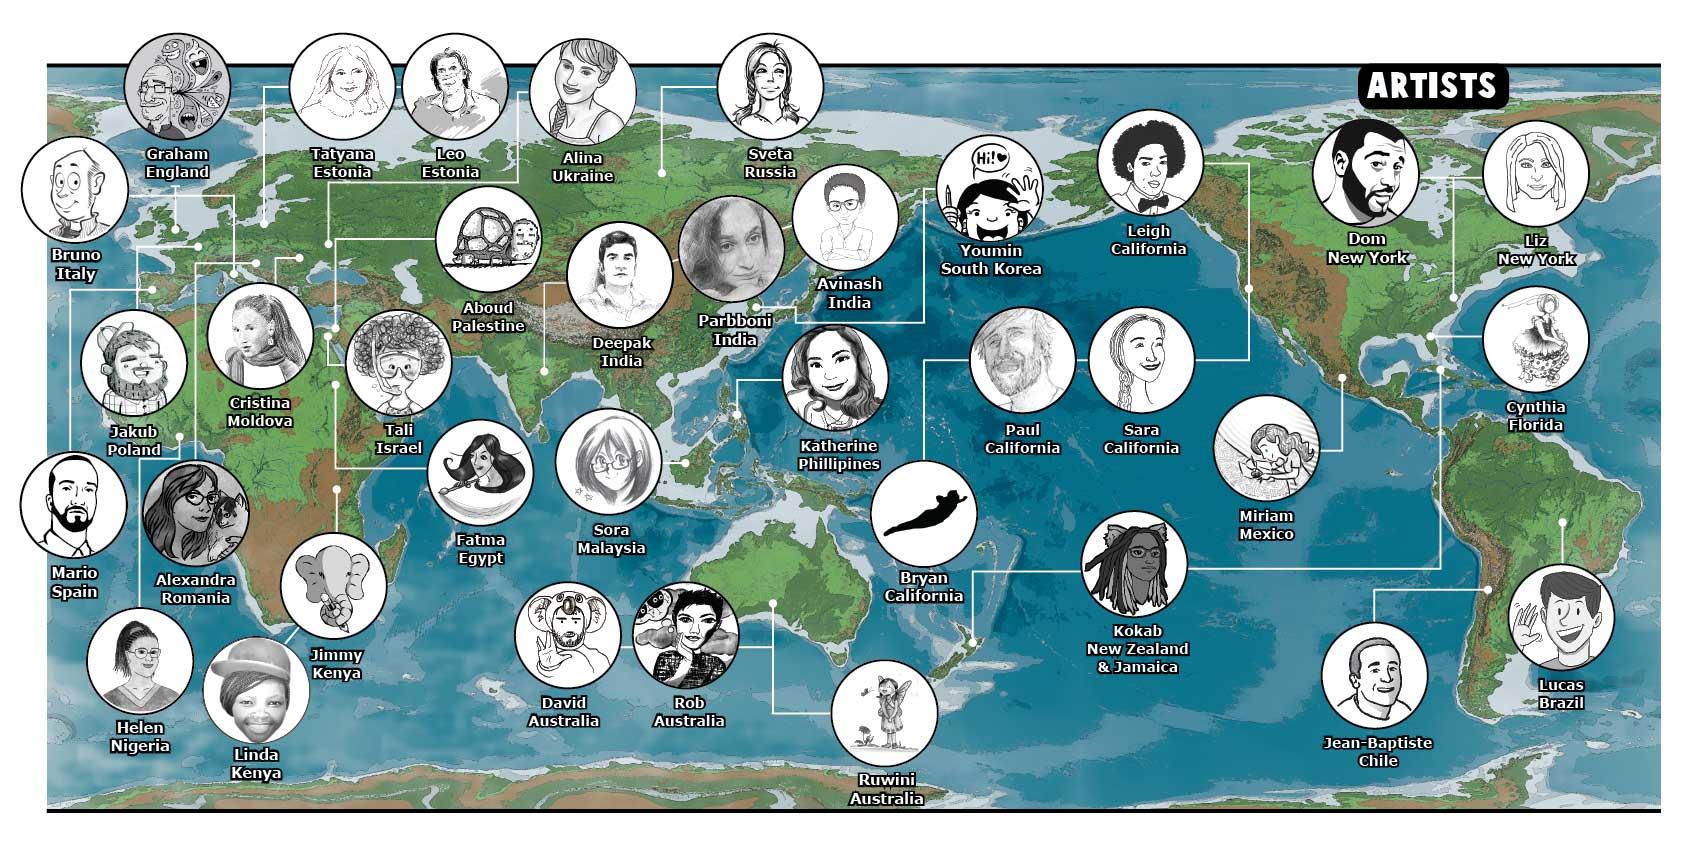 CoreAtlas---Artists-from-around-the-world-MAP-01.jpg